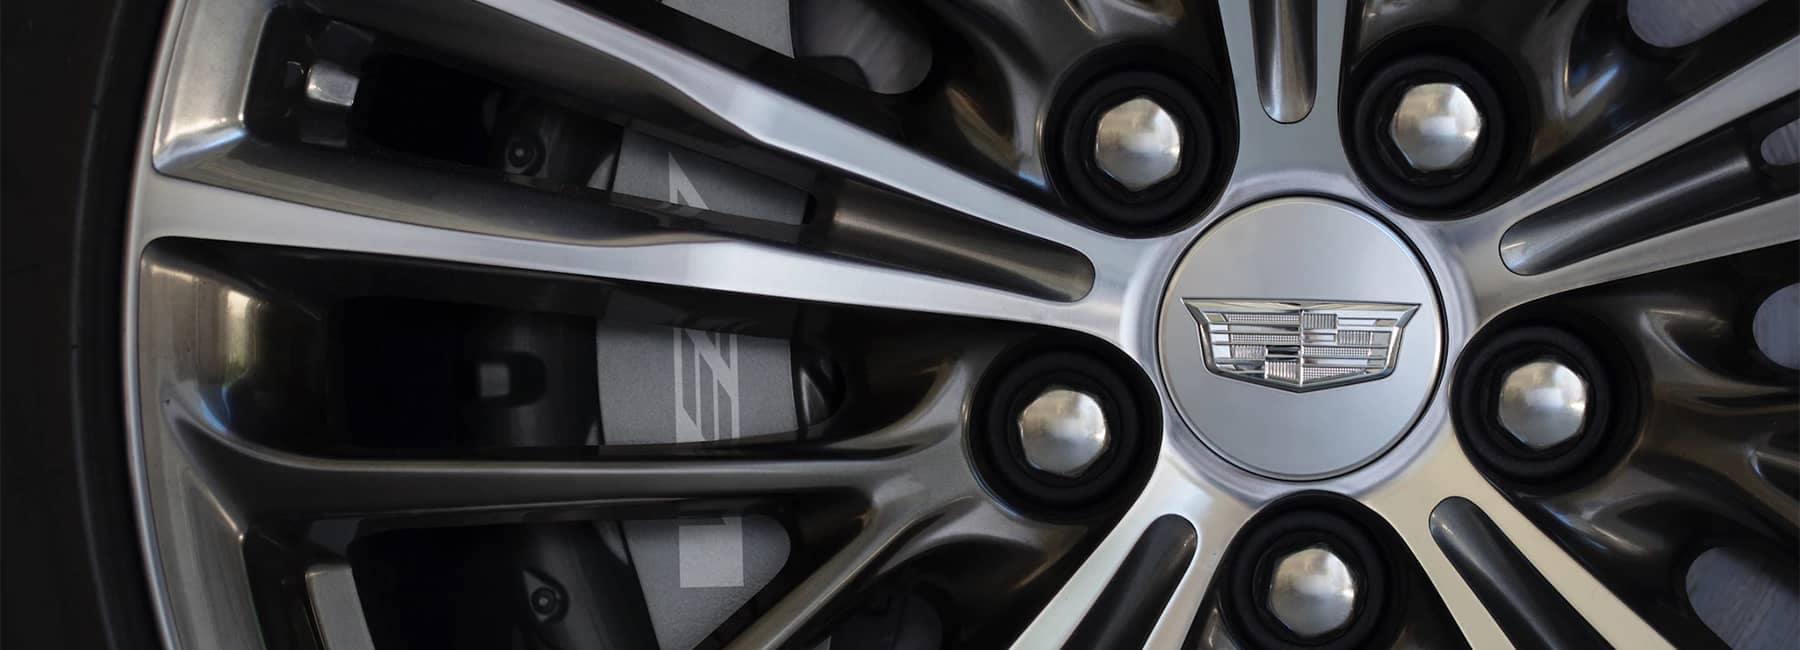 2020 Cadillac CT6-V Sport Sedan Wheel Spokes Close Up